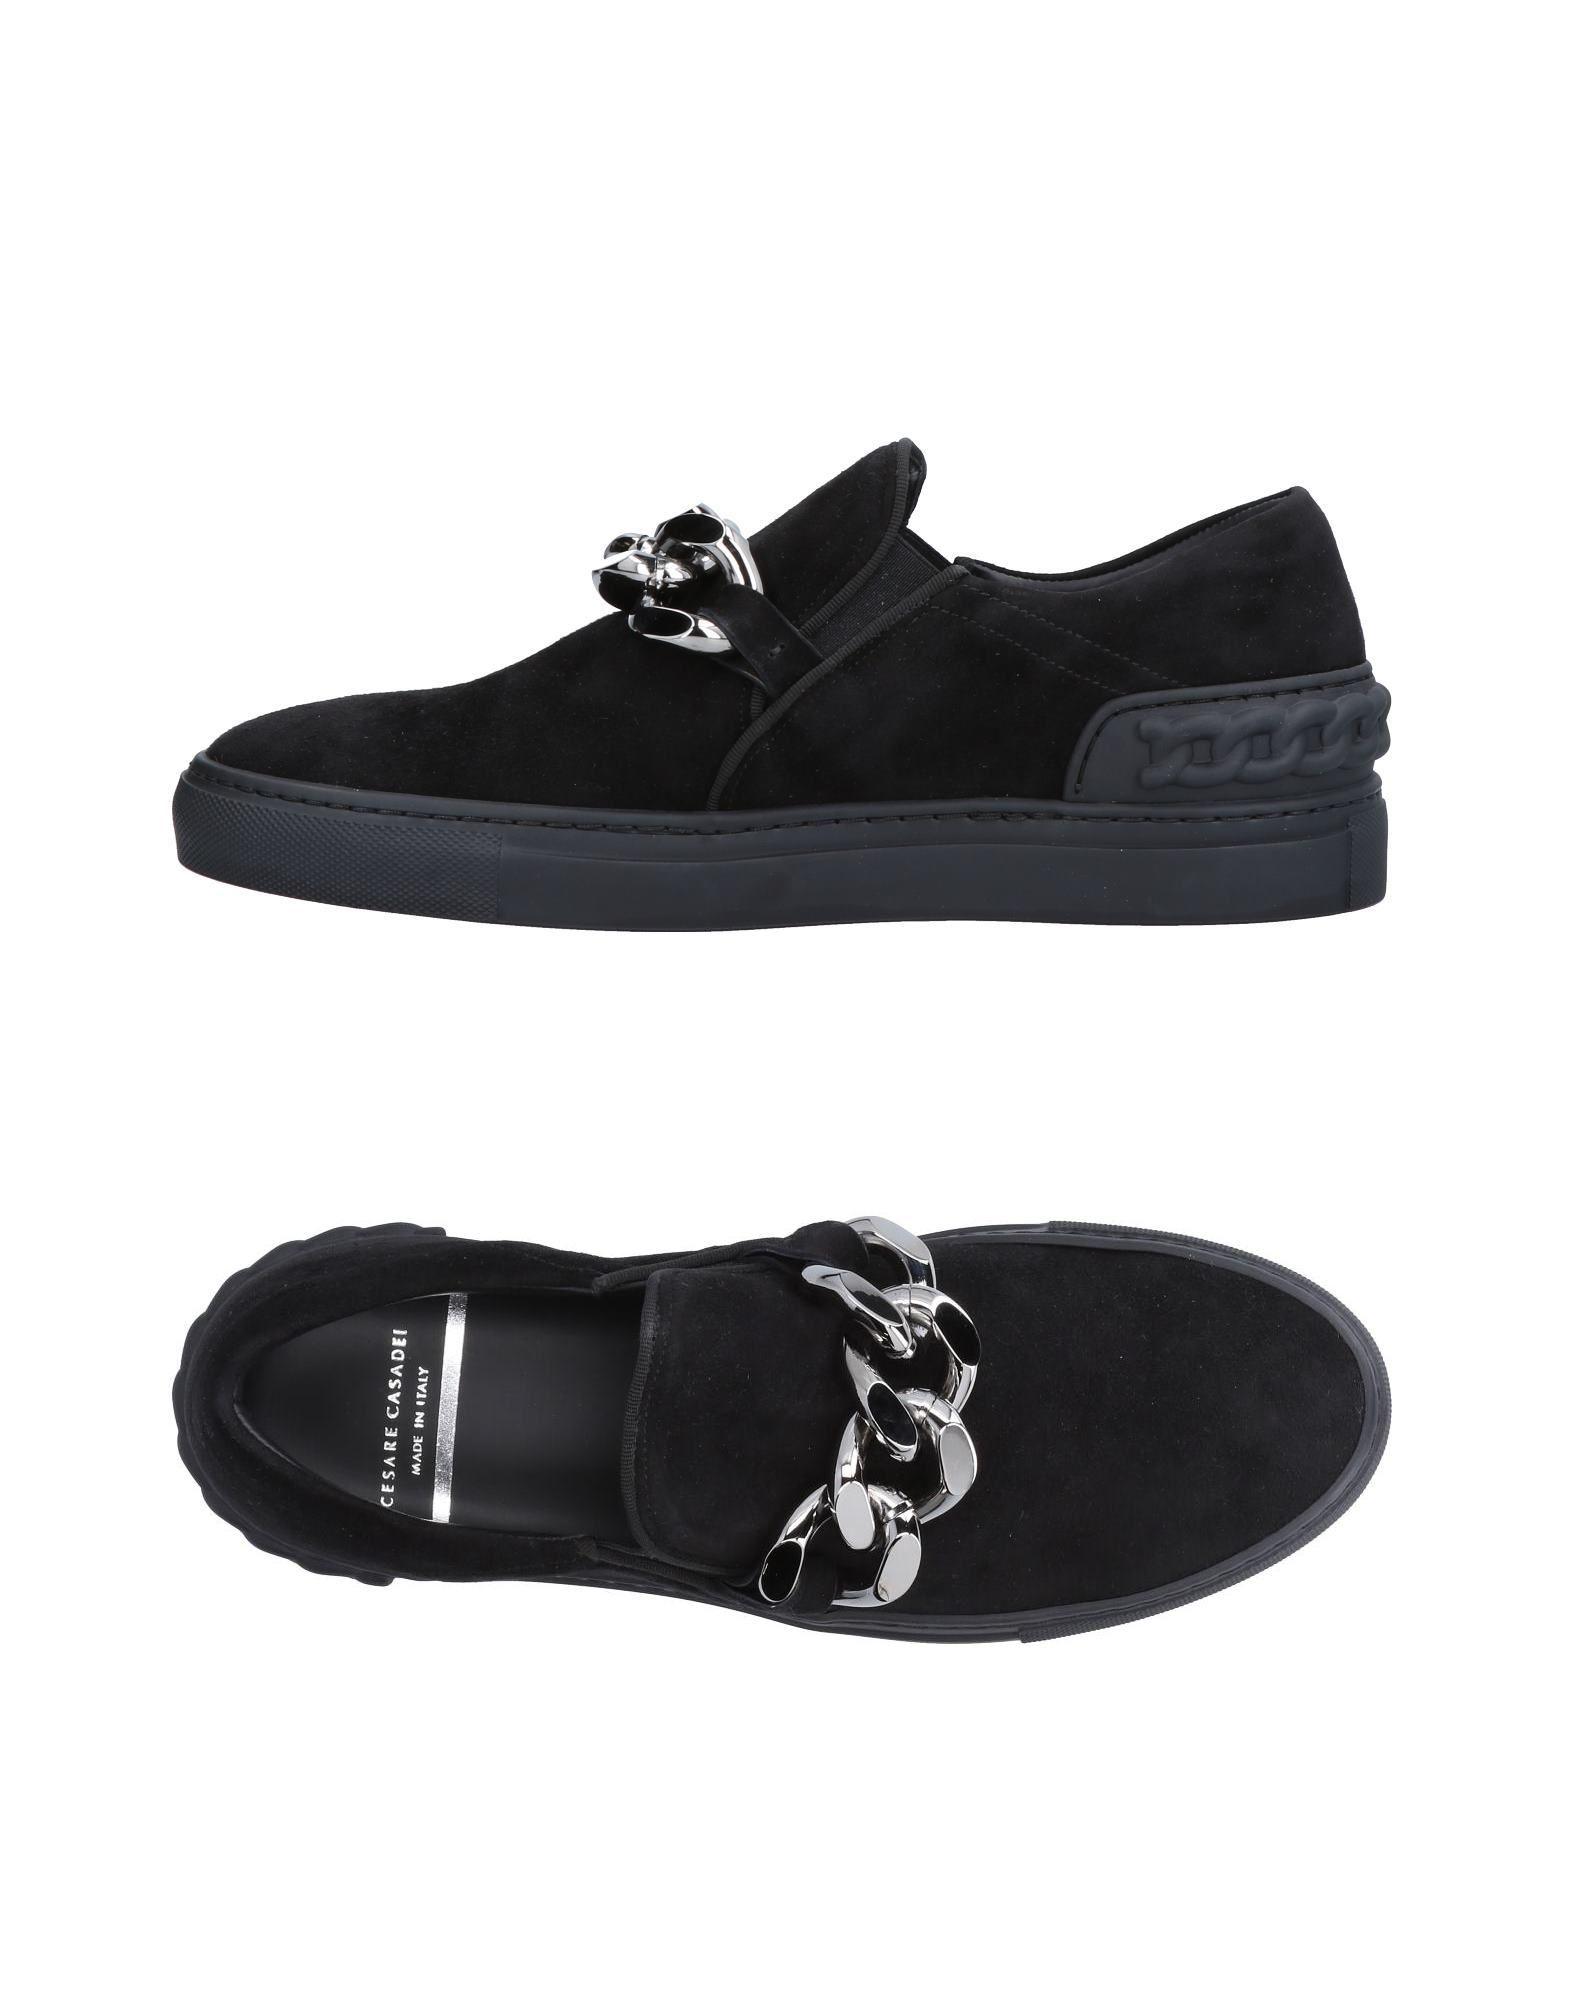 Cesare Casadei Sneakers Herren  11500484TL Gute Qualität beliebte Schuhe